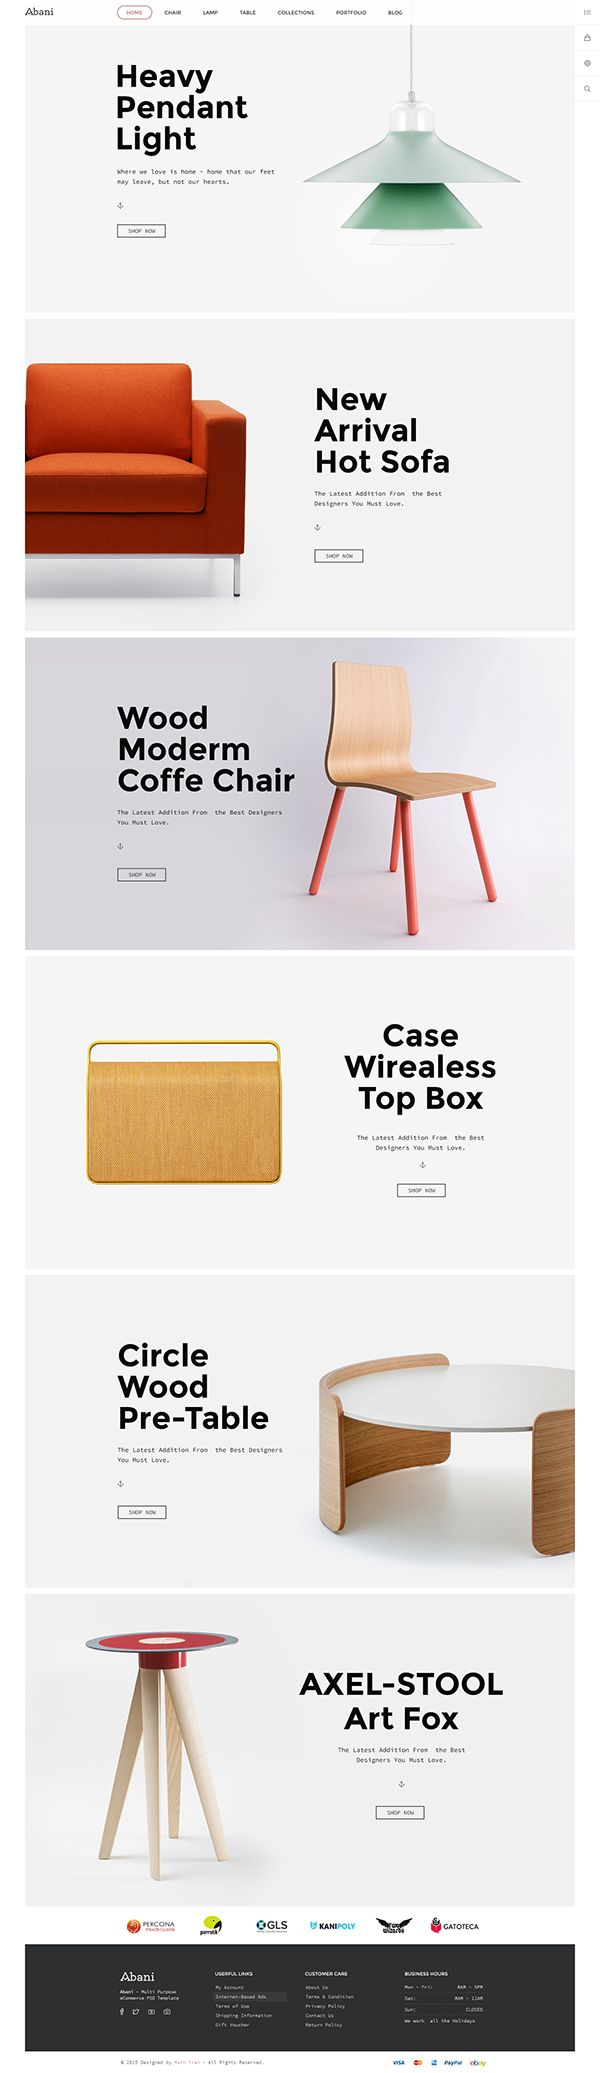 Abani – Multi Purpose eCommerce PSD Template for online Fashion, Furniture…